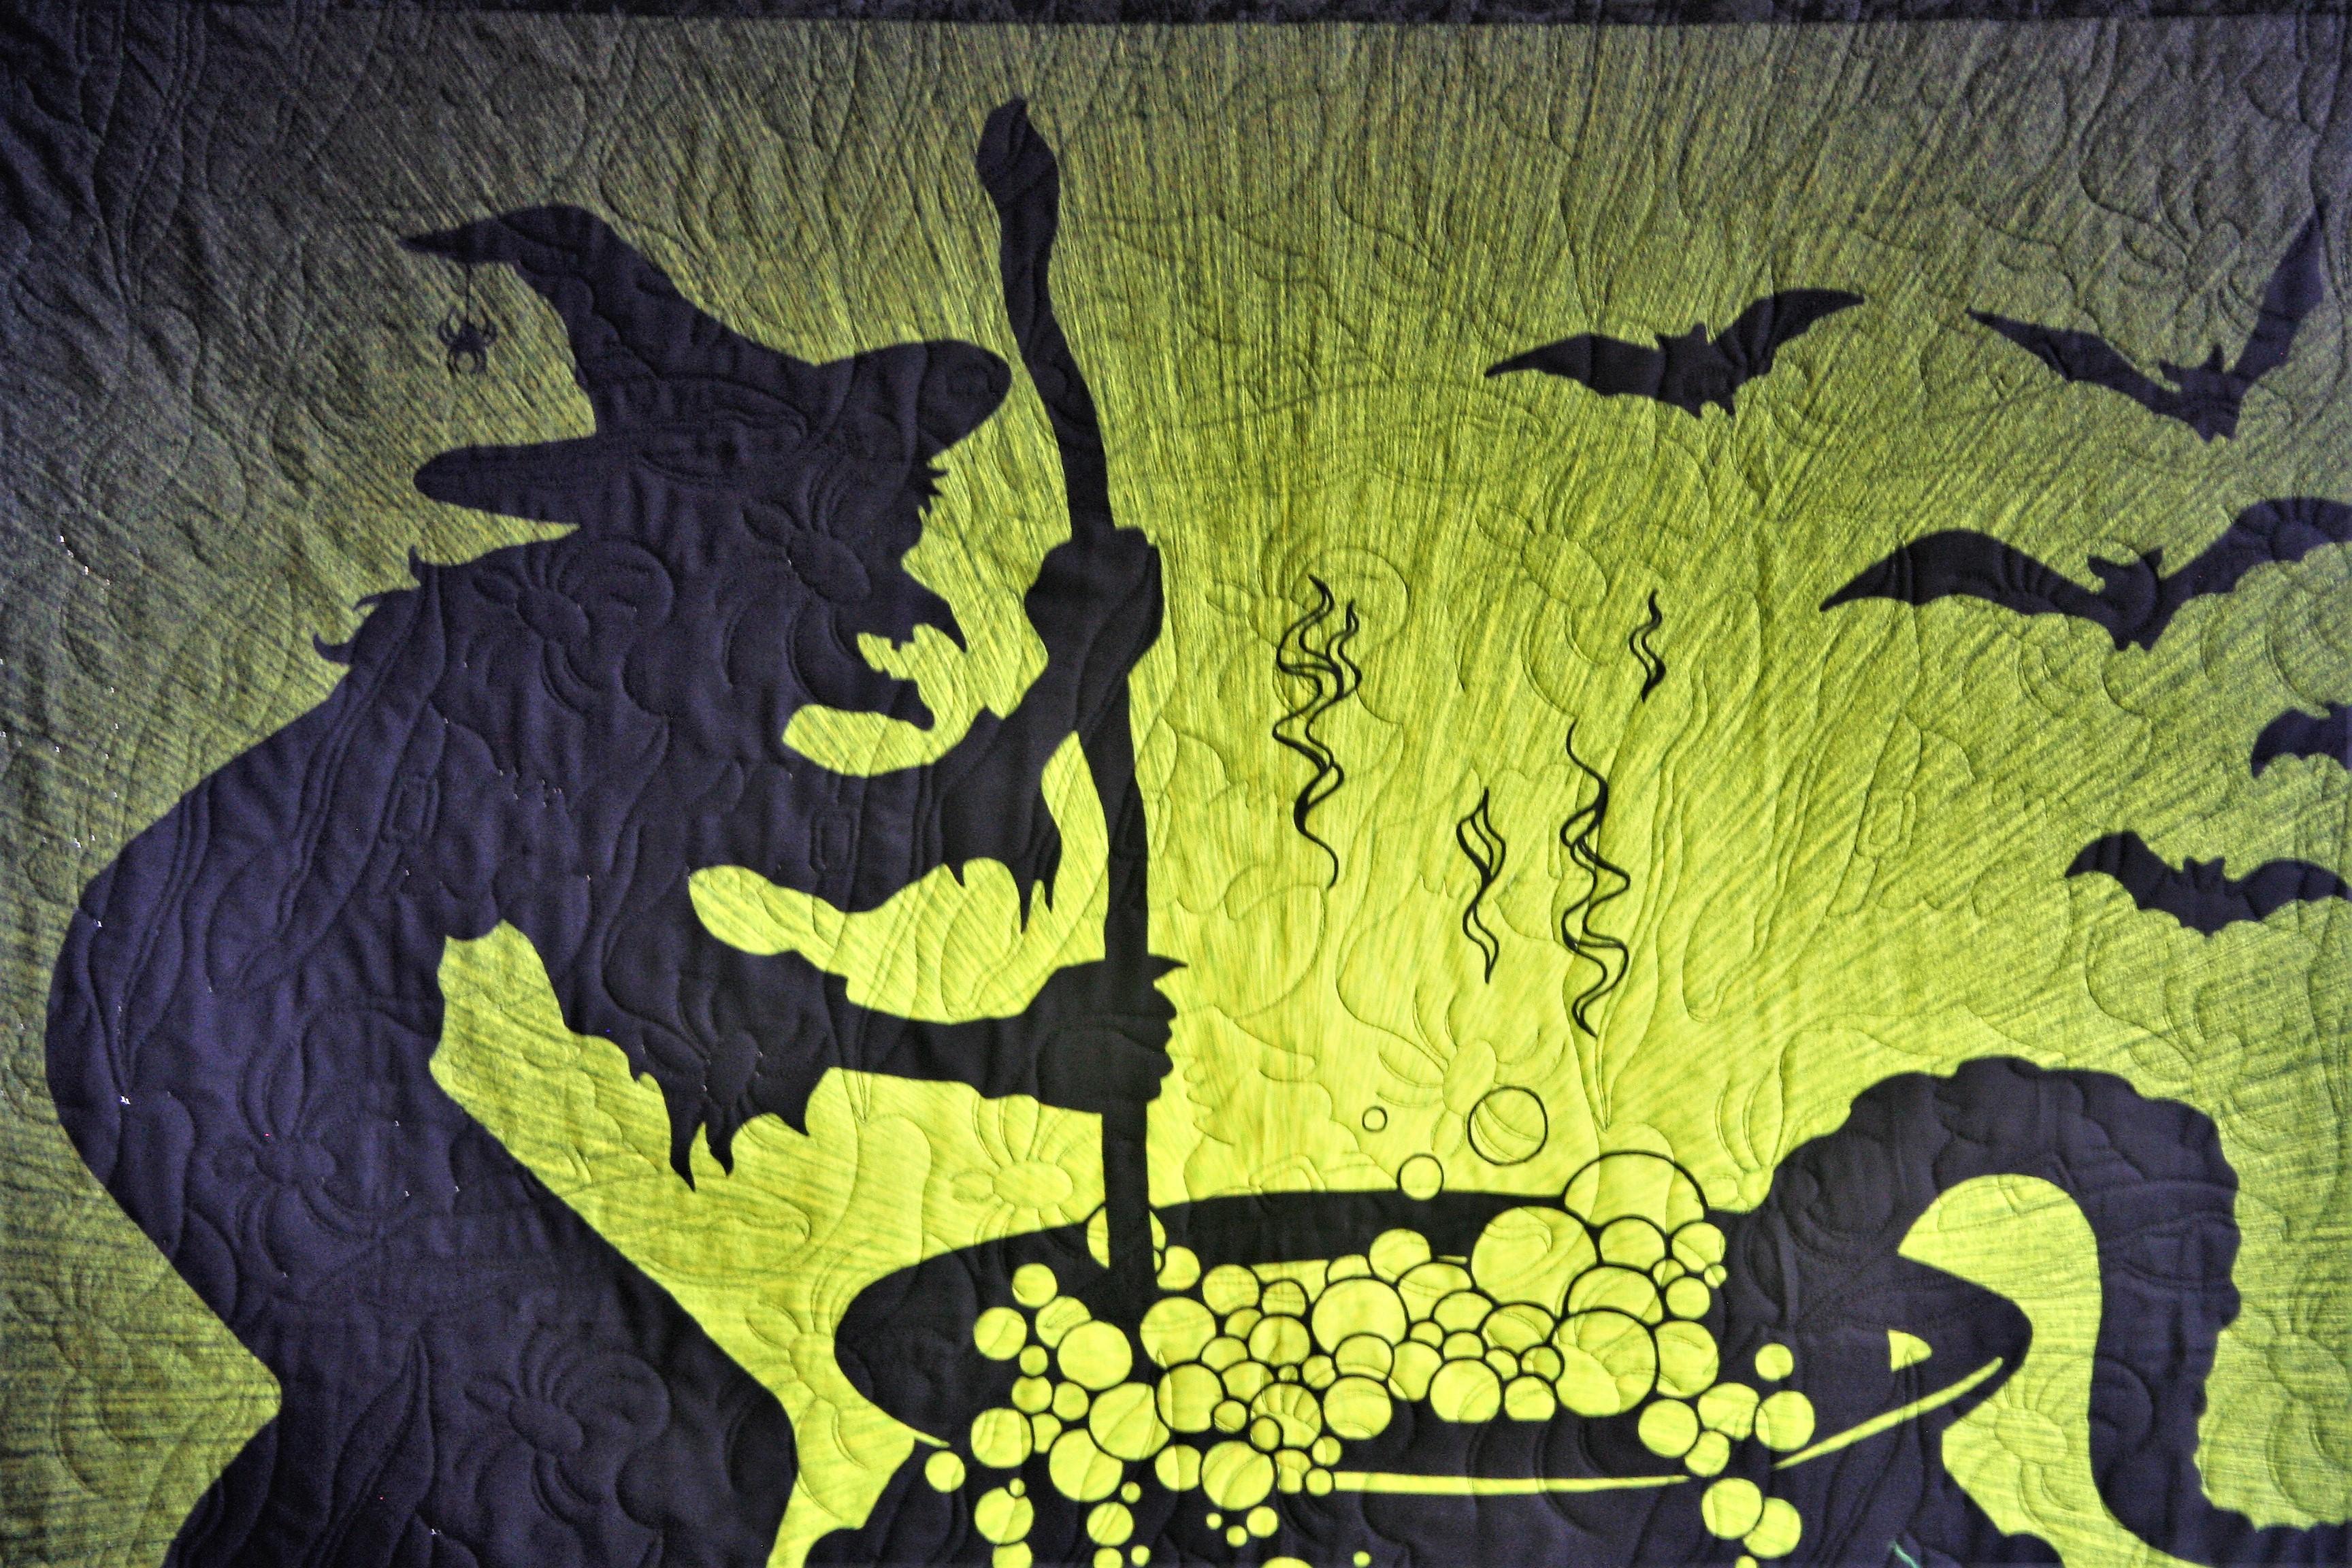 Witches Cauldron (close up)